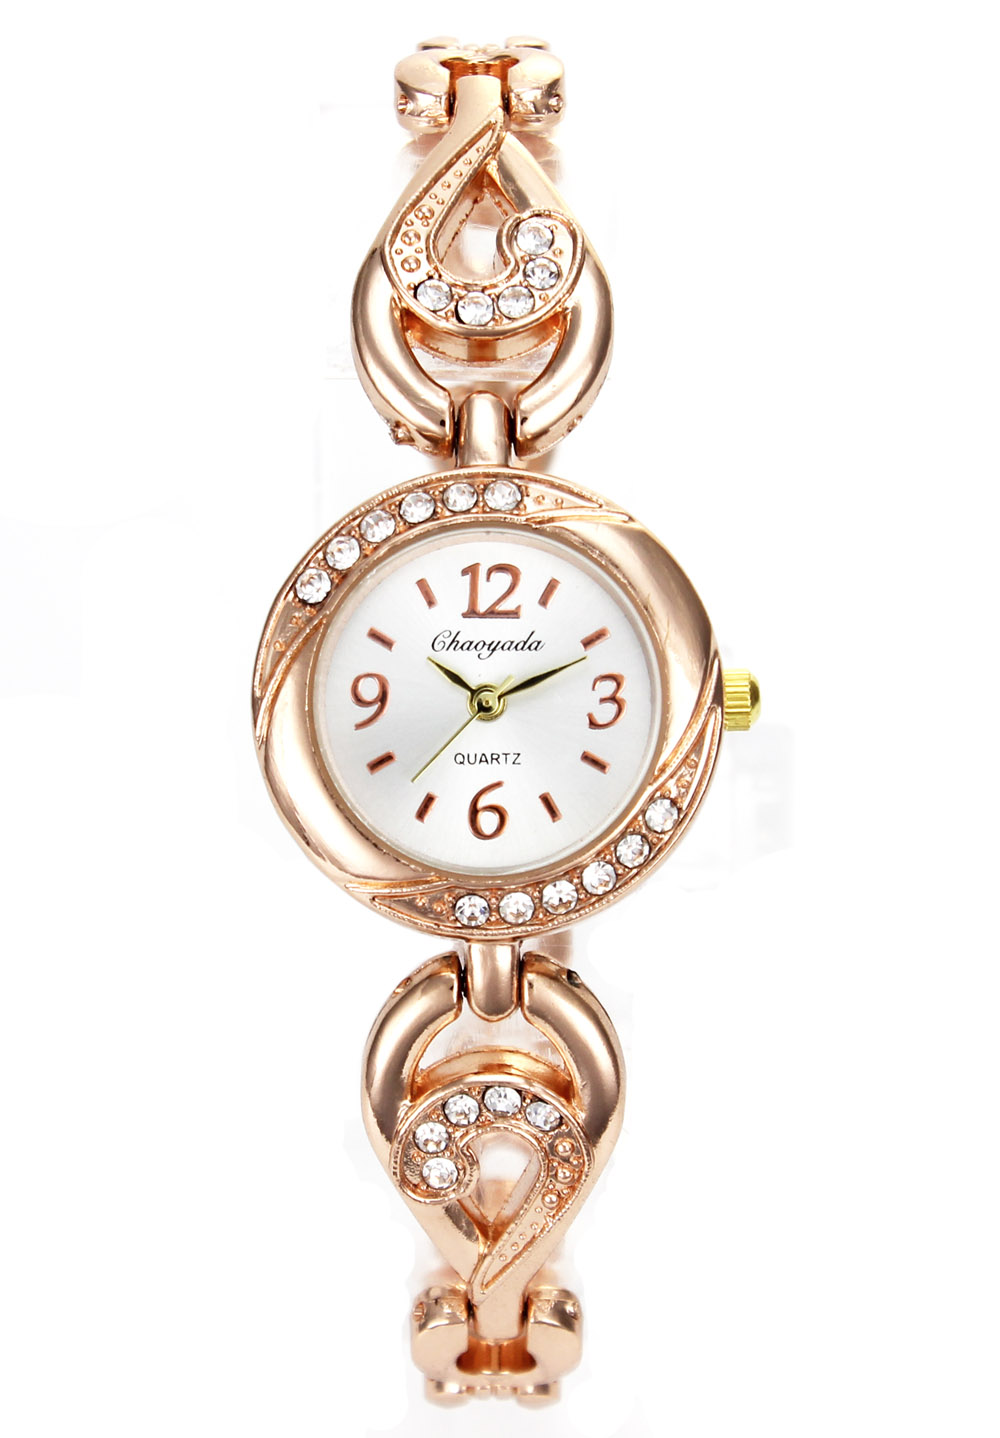 Women's Charm Rose Gold Female Bracelet Watch Fashion Ladies Crystal Chain Choker Necklace Wrist Watches fashion rose pattern wide bracelet w crystal golden